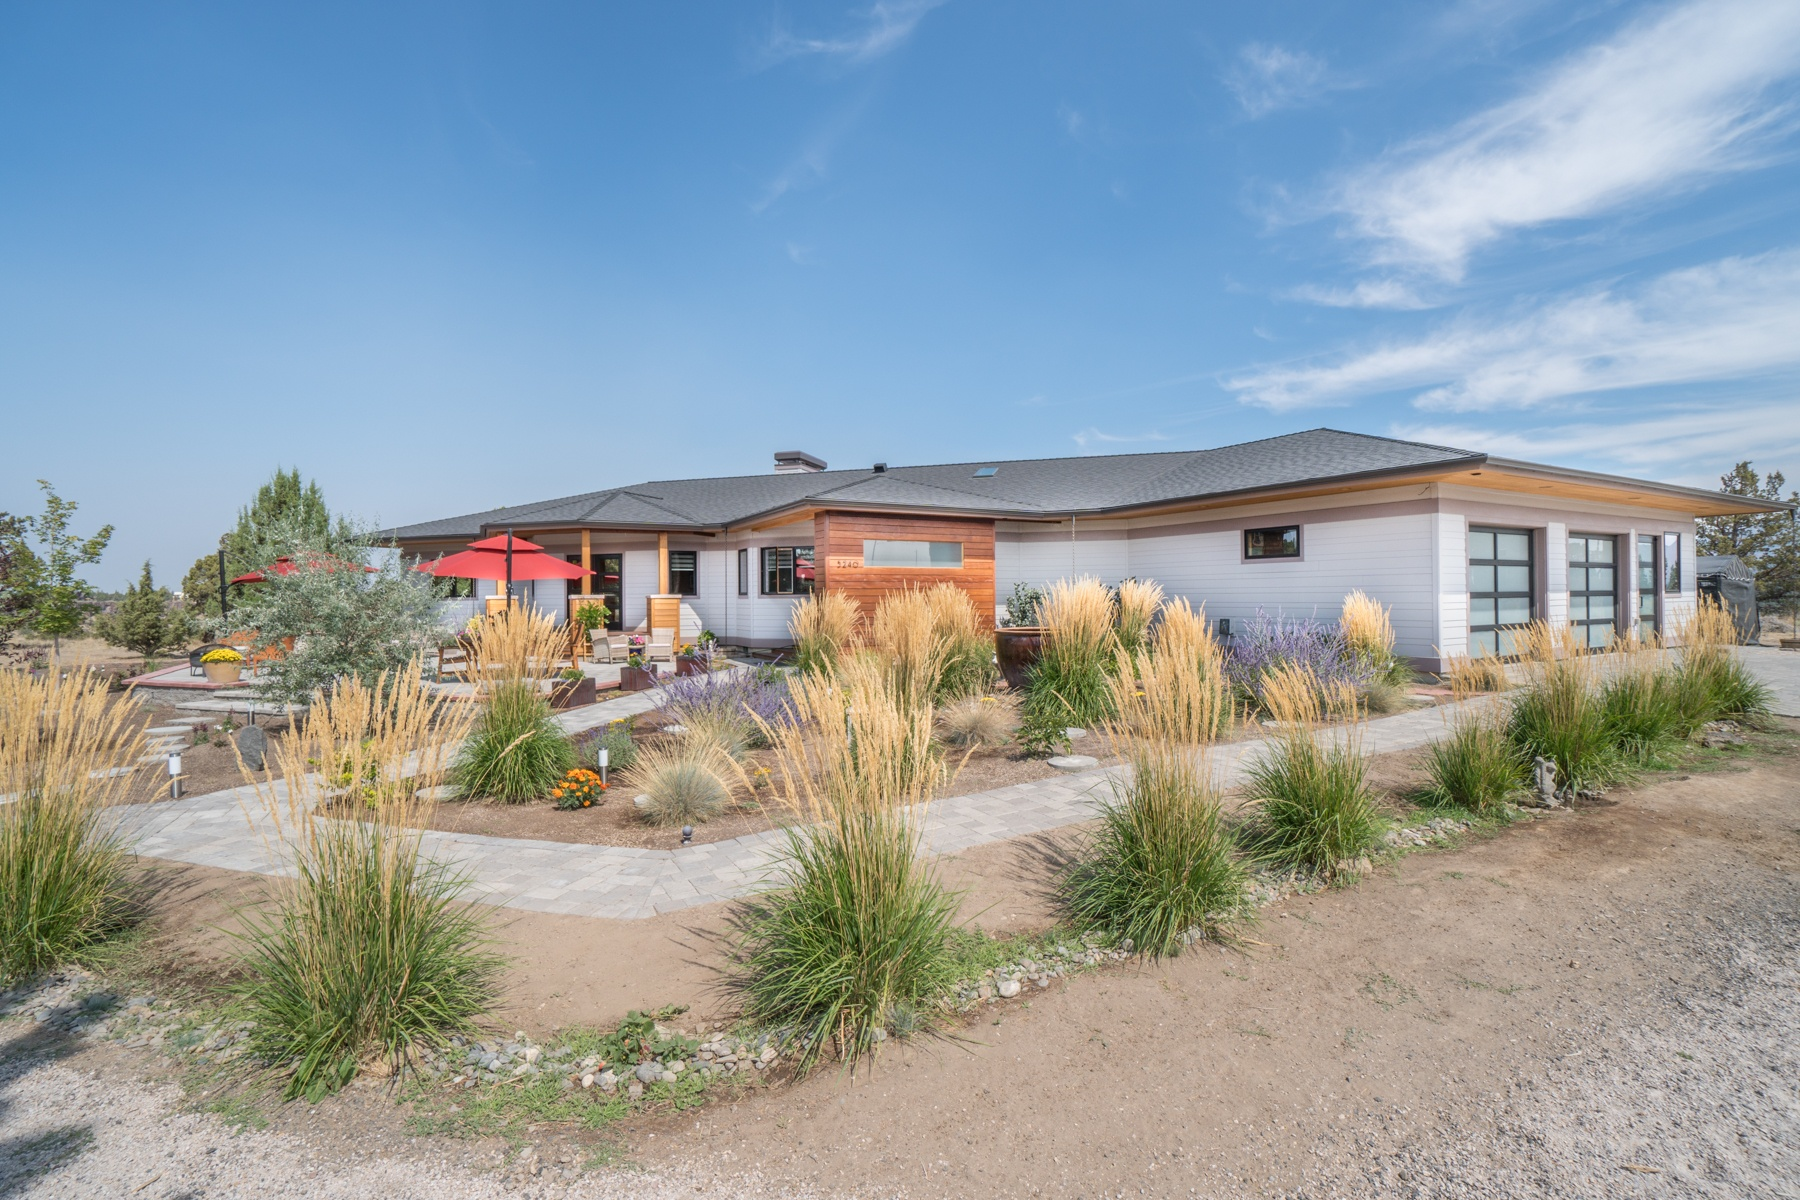 独户住宅 为 销售 在 Central Oregon Masterpiece 5240 SW Badger Rd 泰勒伯恩, 俄勒冈州, 97760 美国